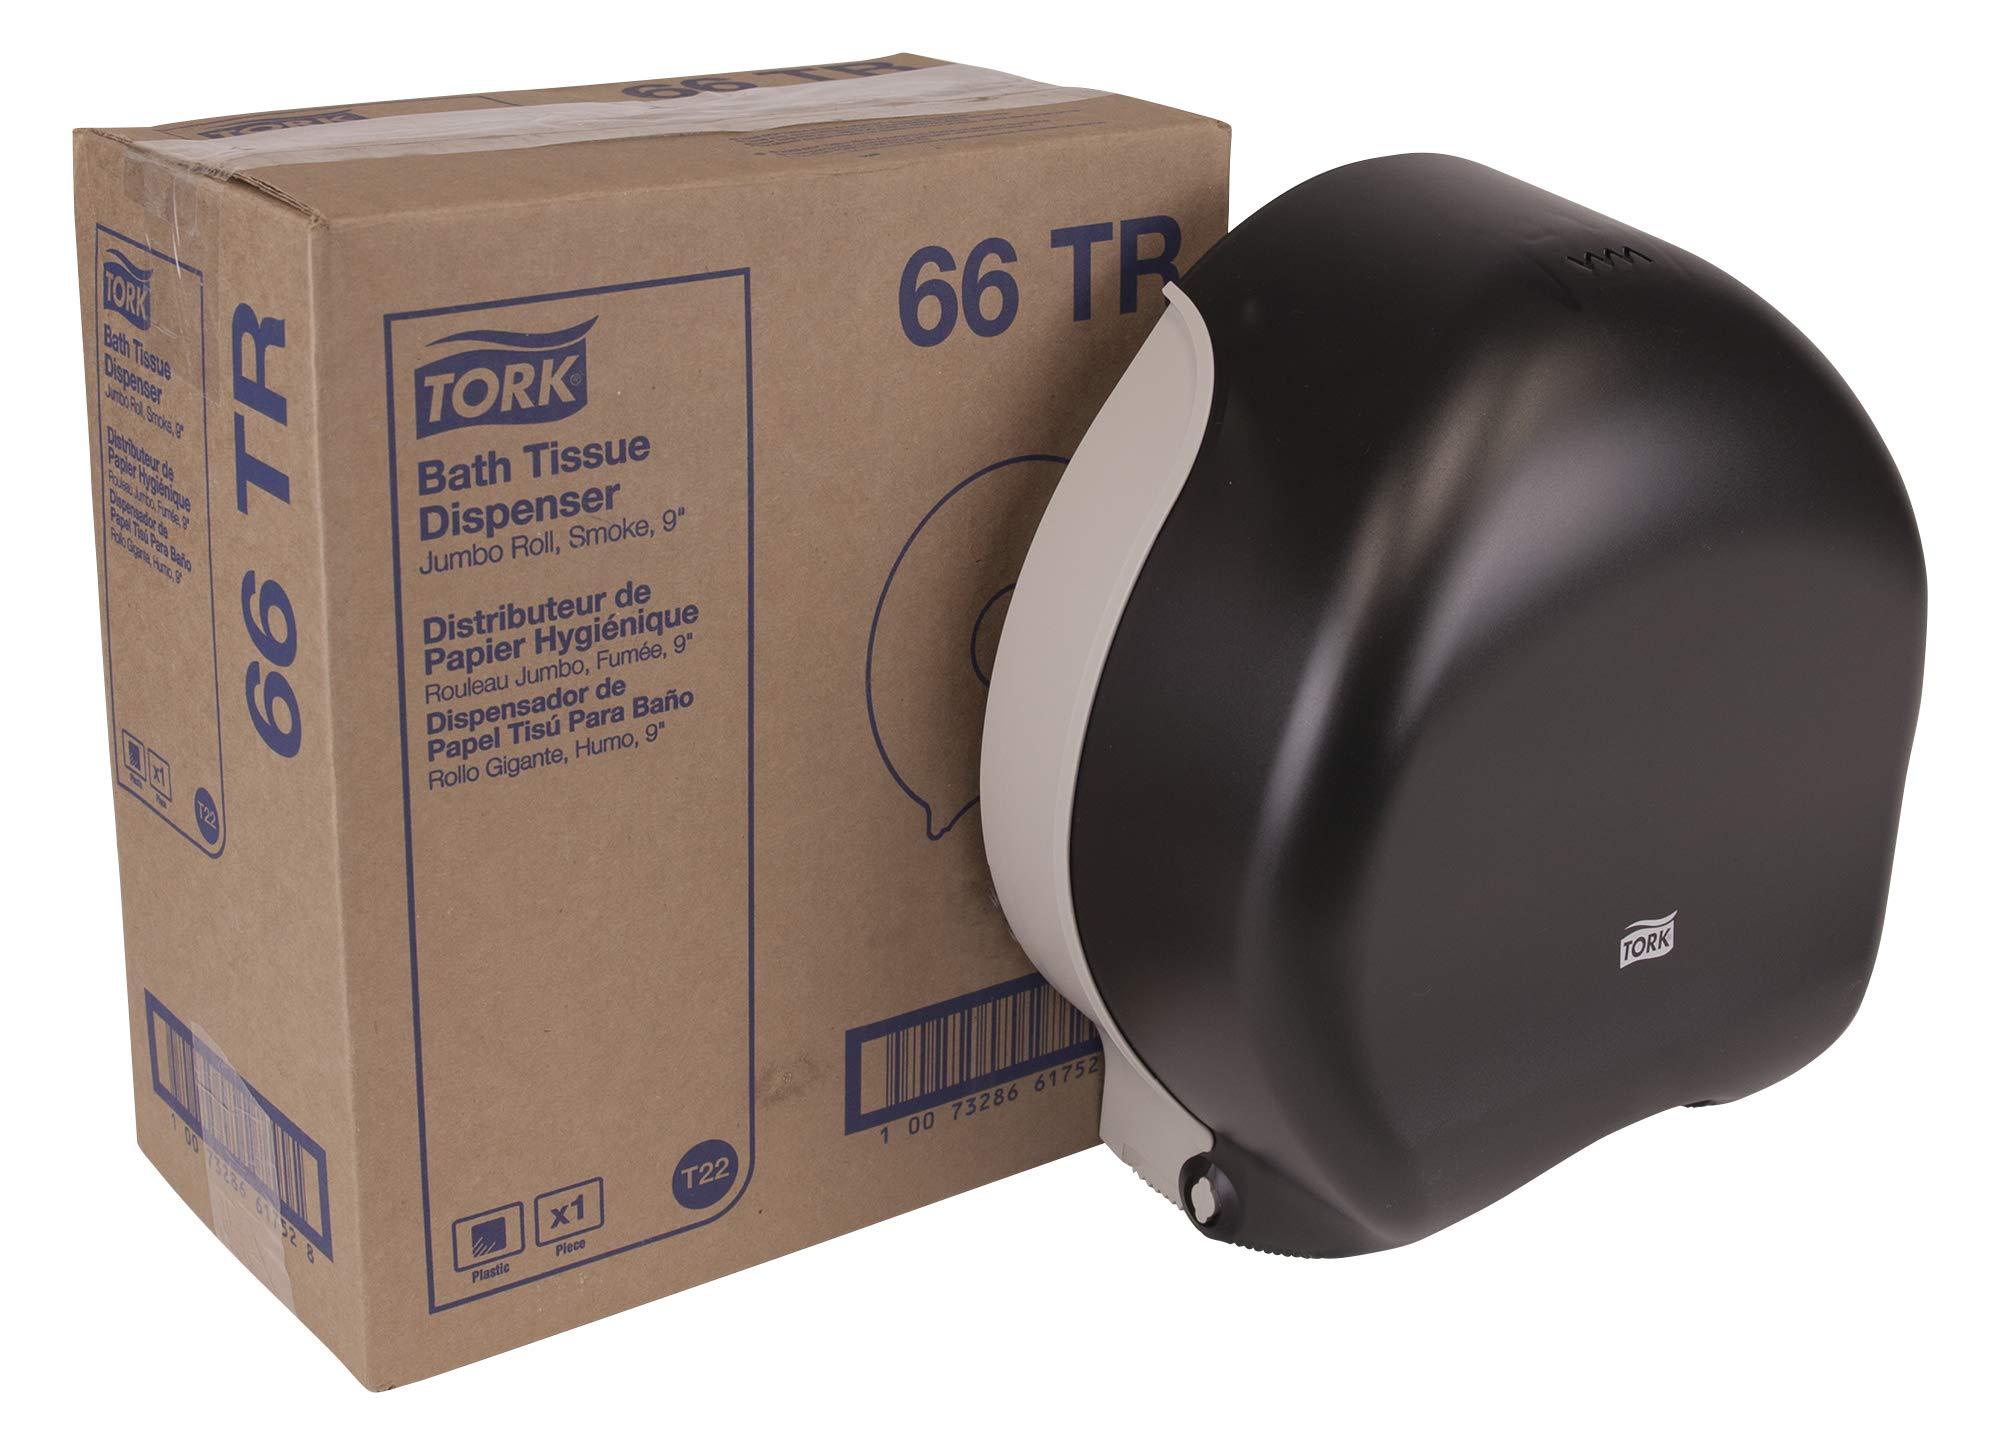 Tork 66TR Jumbo Bath Tissue Roll Dispenser, 9 inch, Plastic, 12'' Height x 10.63'' Width x 5.75'' Depth, Smoke (Case of 1) for use with Tork TJ0912A, TJ0921A, TJ0922A, TJ0924